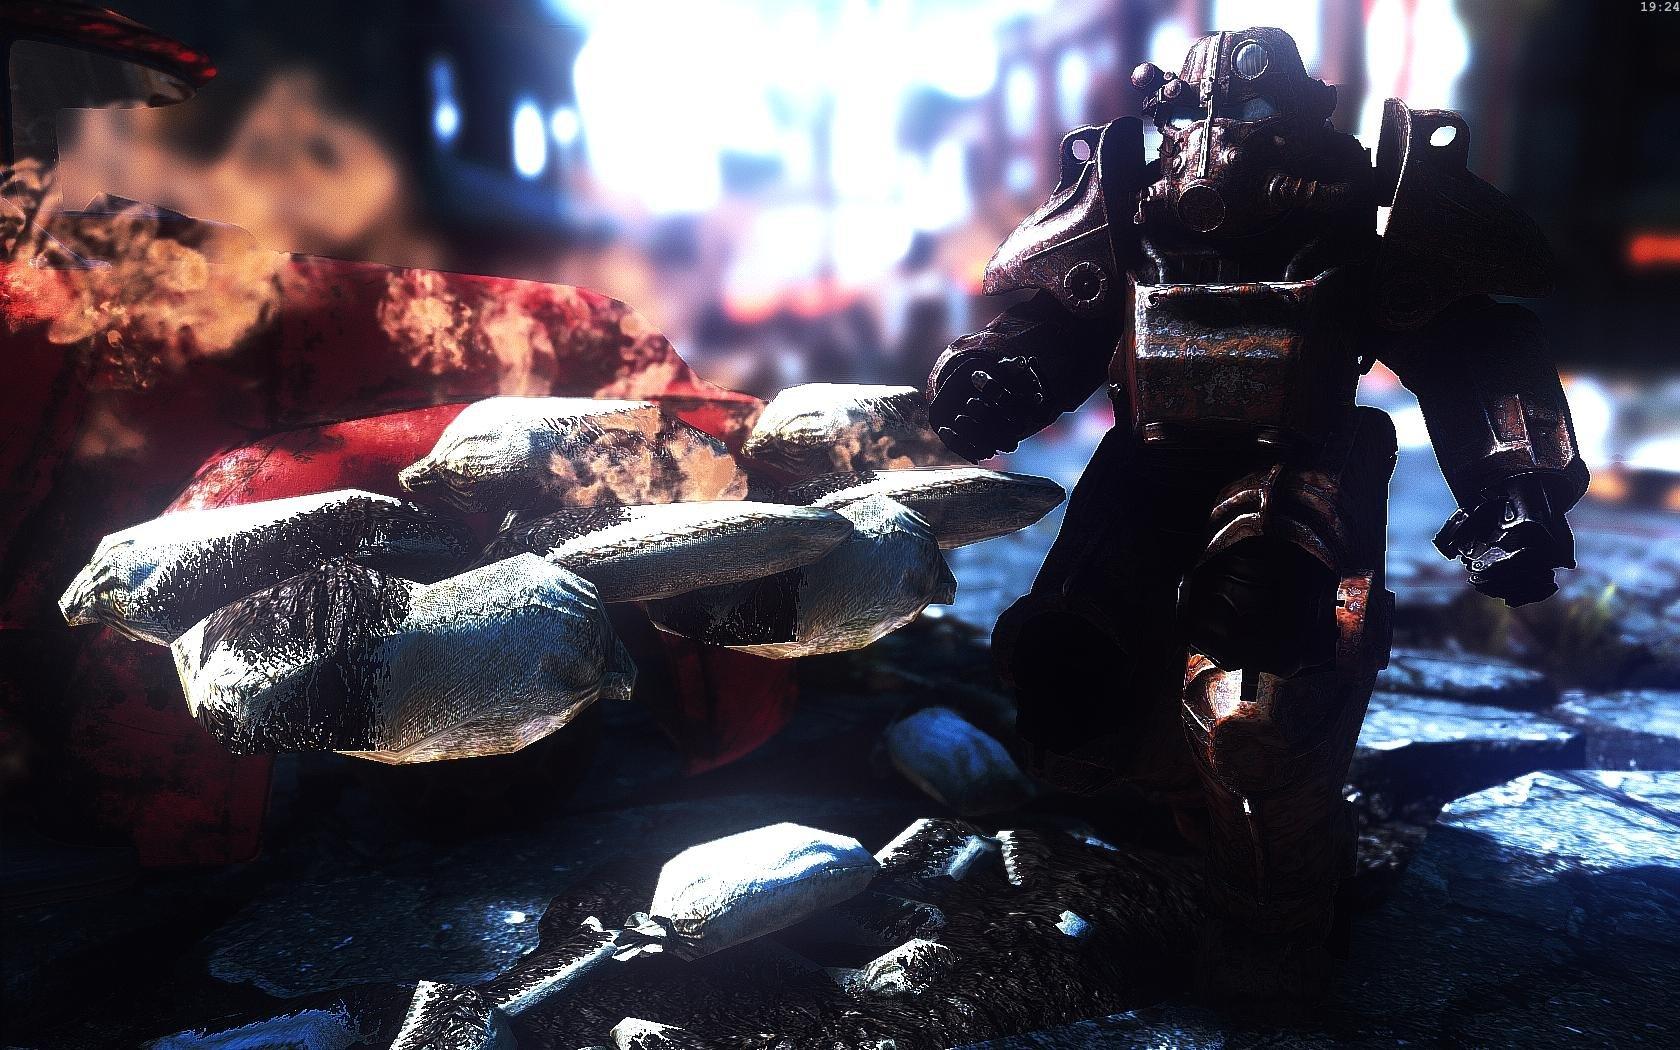 Fallout4 2019-01-17 19-24-13-68